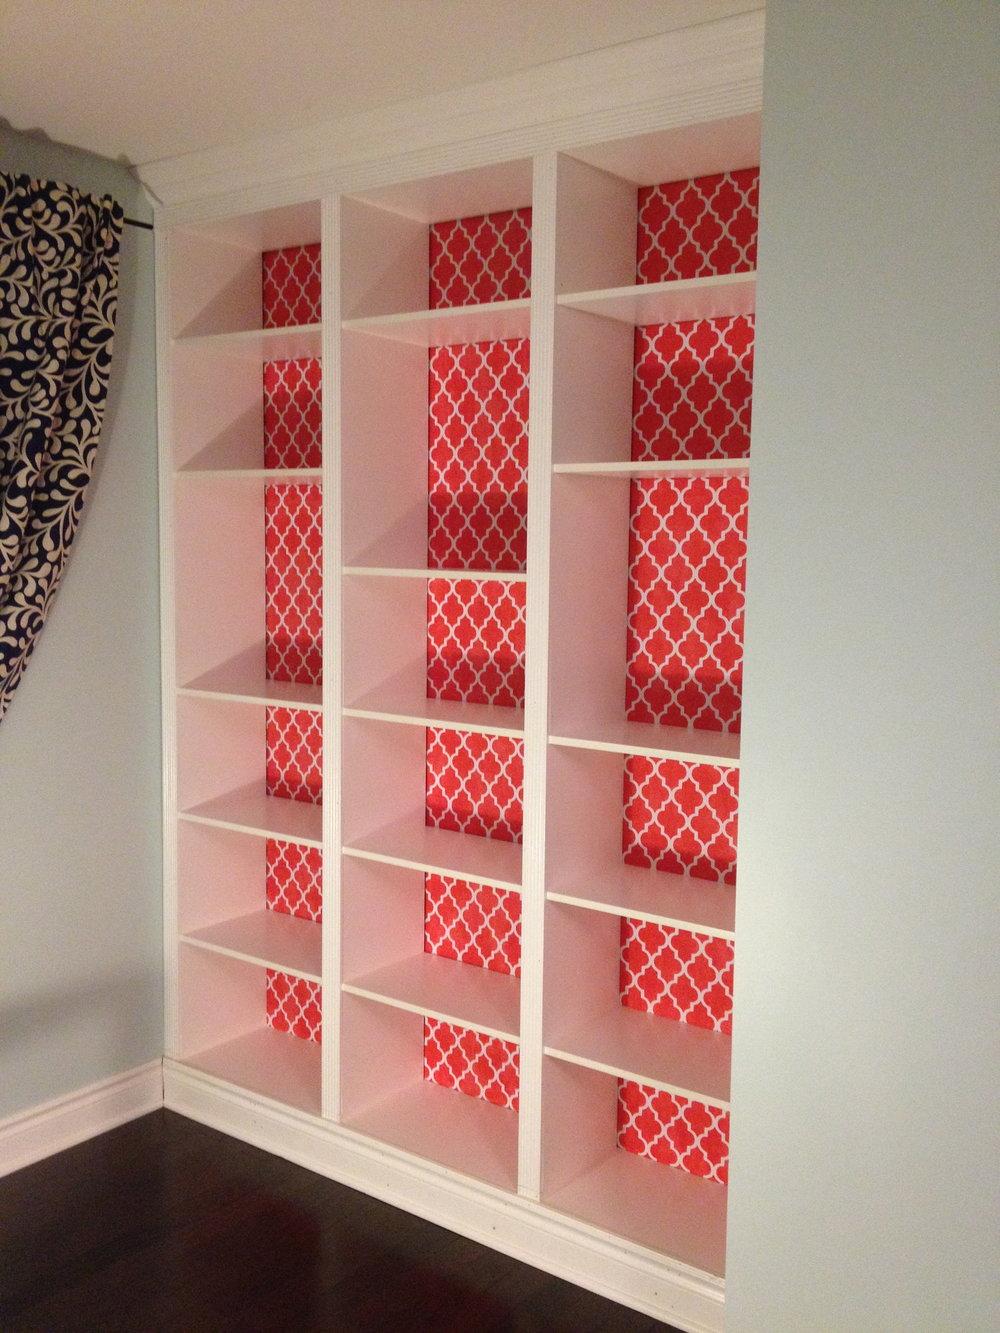 DIY built-in shelving, DIY built-ins, DIY shelves, DIY MDF shelving, DIY MDF, MDF built-in shelving, MDF built-in shelves, DIY bedroom reno, girl's bedroom decorating ideas, girls' bedroom decorating ideas, modern built in shelving, DIY modern shelves, modern home decor, DIY home renovating projects, DIY projects, DIY home reno, custom built-ins, DIY custom built-in shelving, painted MDF shelves, DIY bedroom decor, coral bedroom, light blue bedroom, light blue and coral bedroom, coral quatrefoil, coral quatrefoil decor, DIY storage ideas, modern storage ideas, bedroom storage ideas, bidziu handmade, bidziu handmade